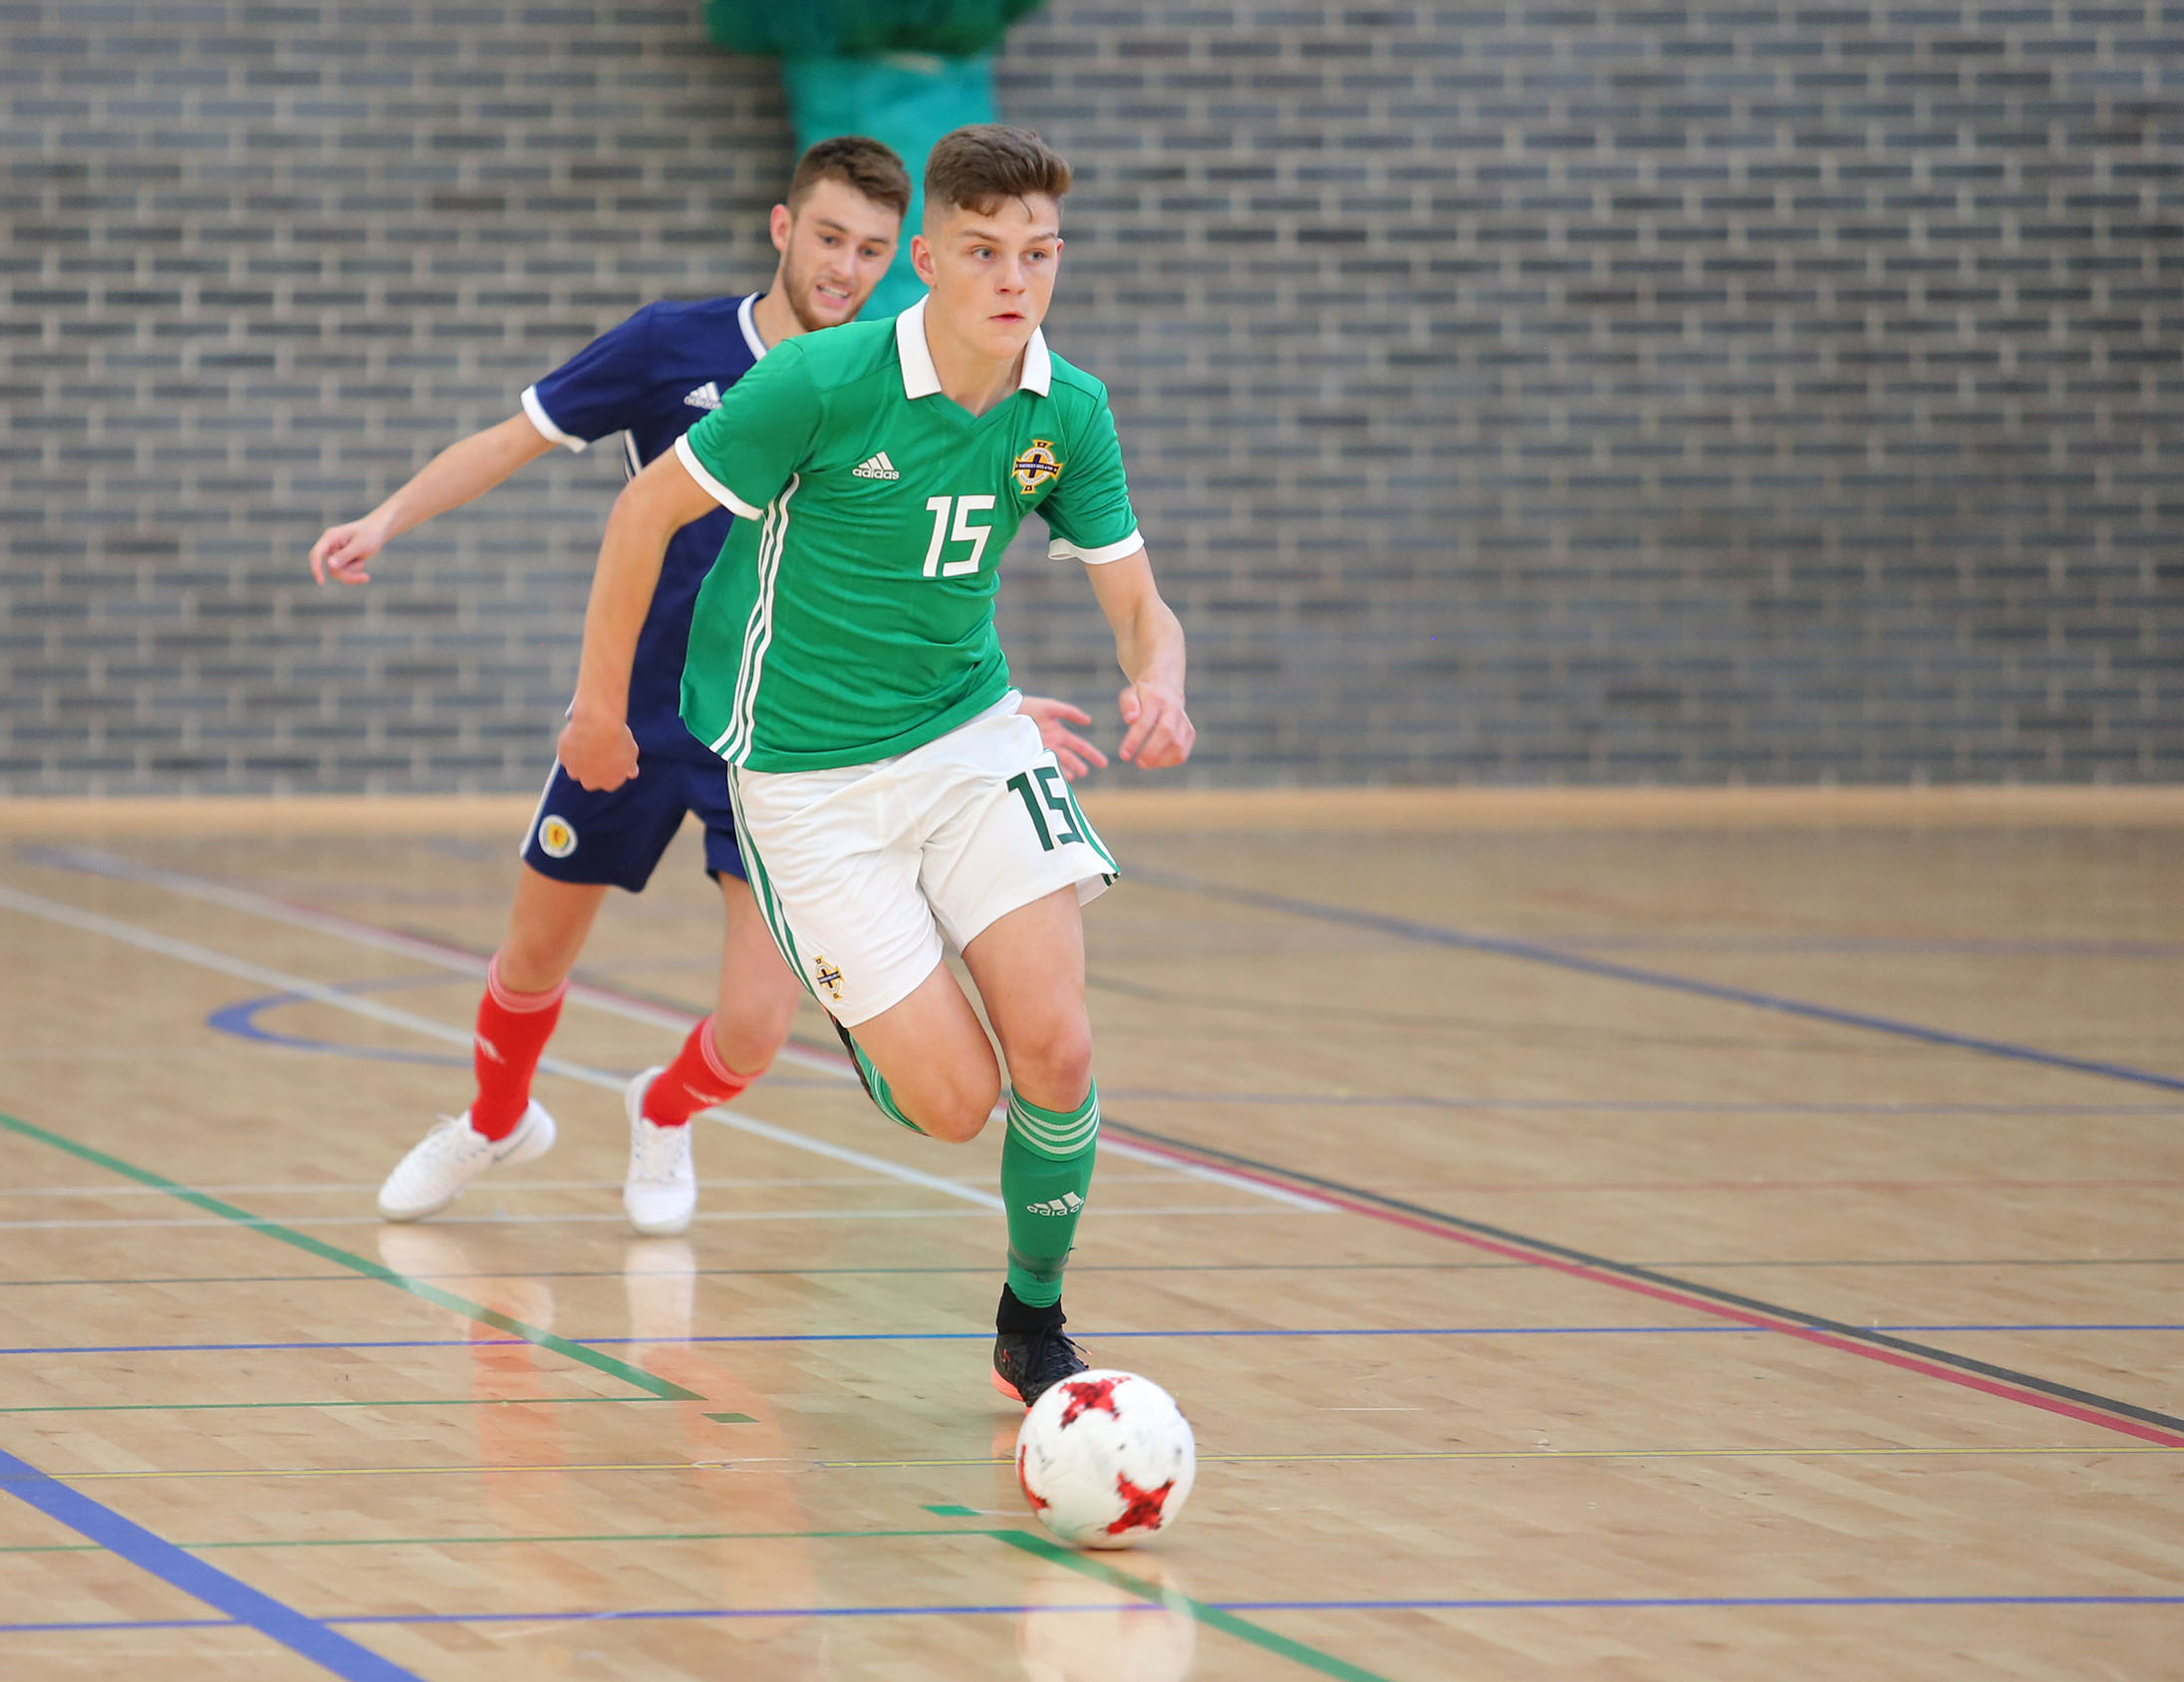 IFA Futsal players gain an edge with Performa Sports